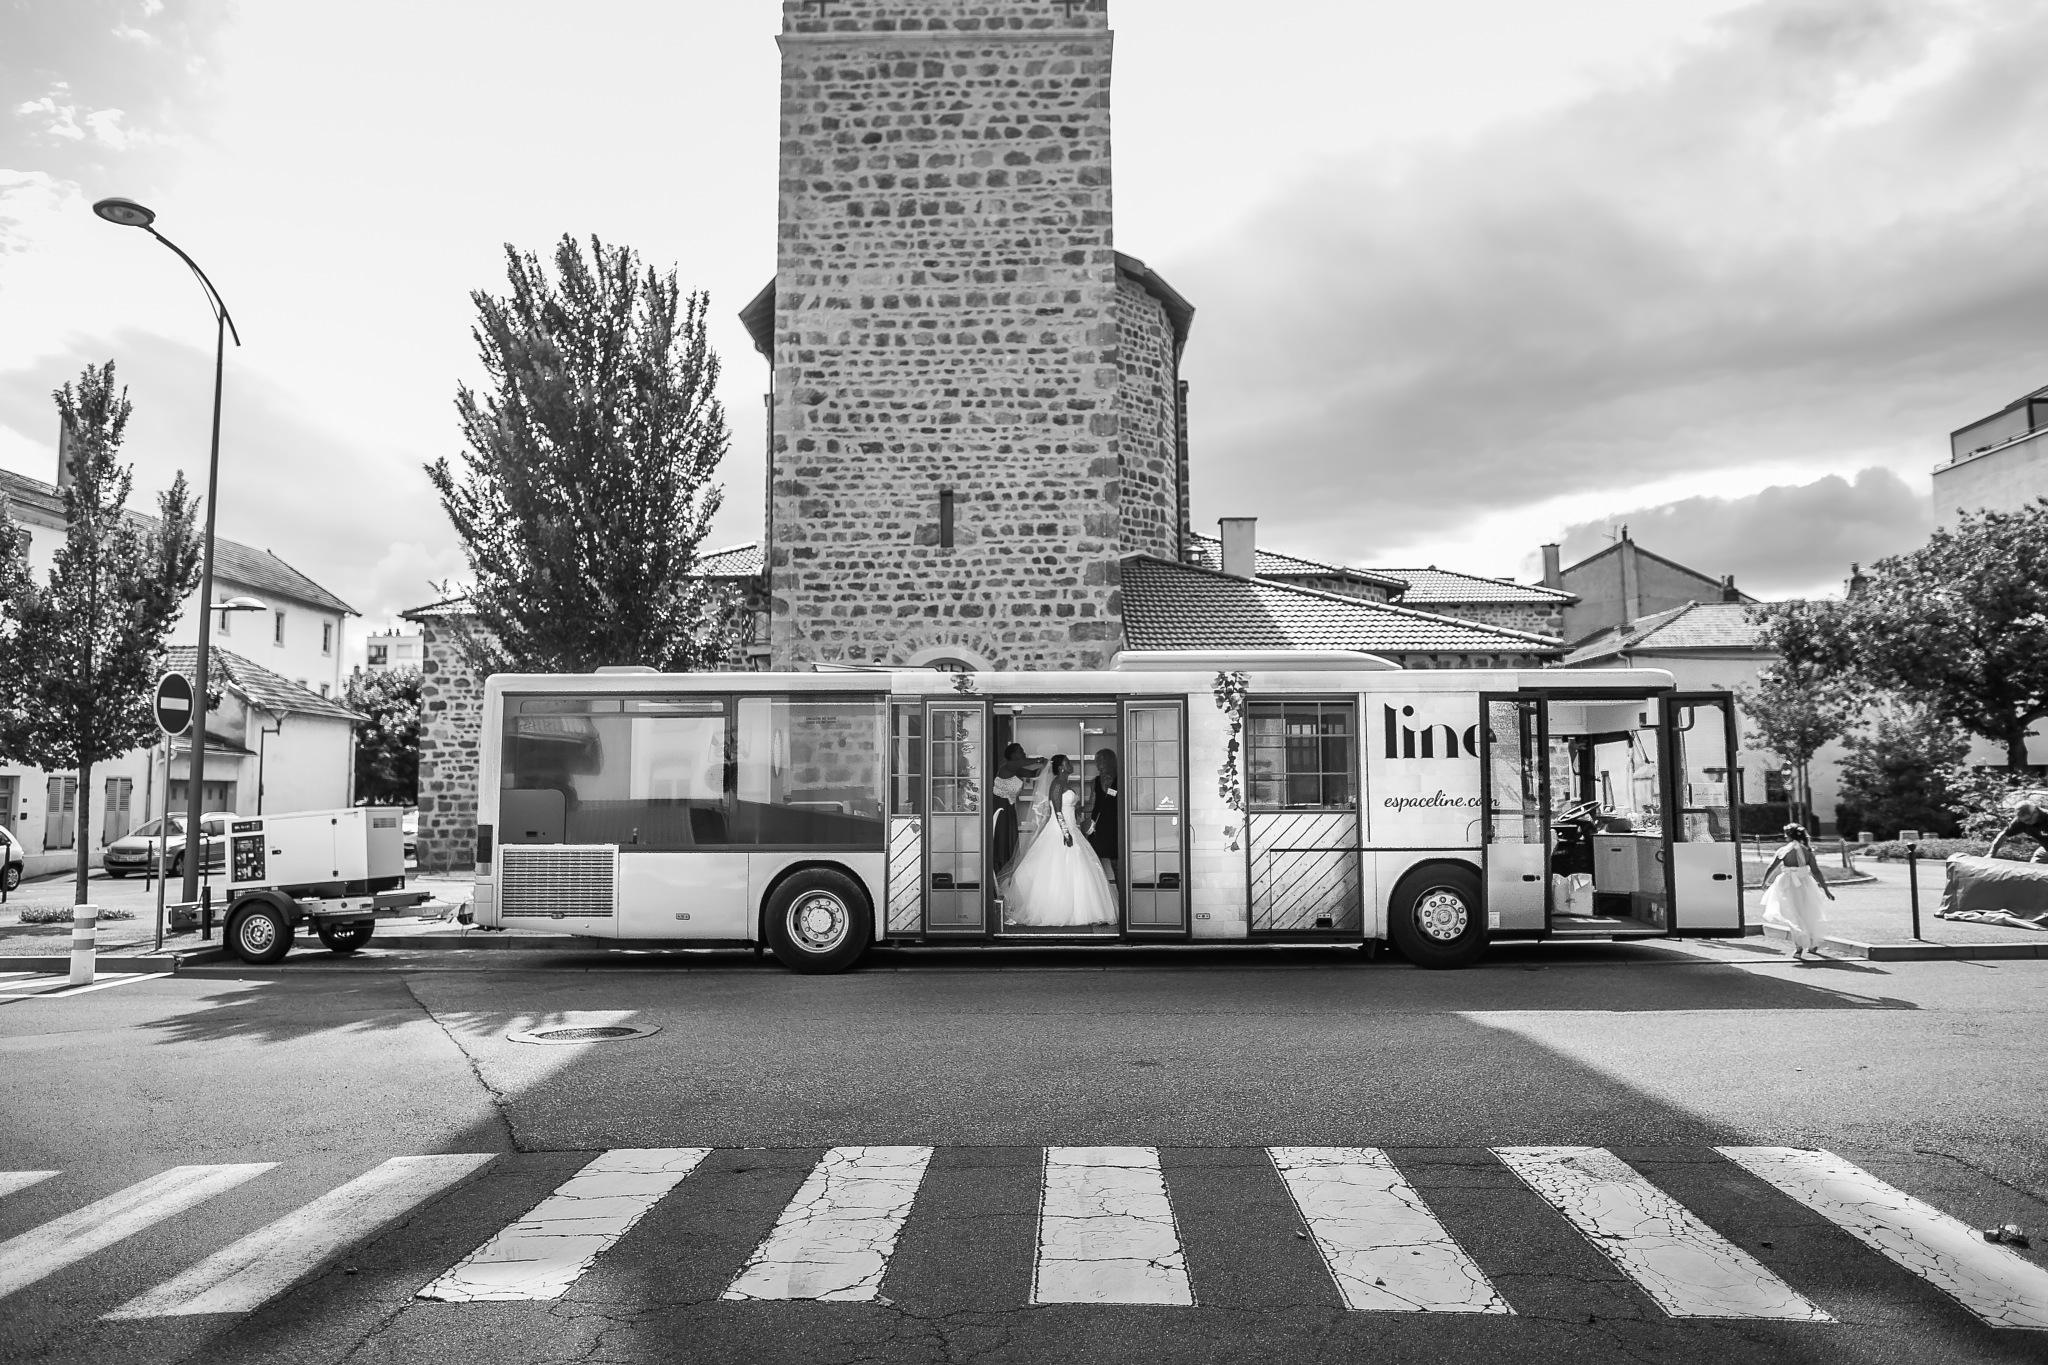 Weding by Nathalie Pugeat Roux